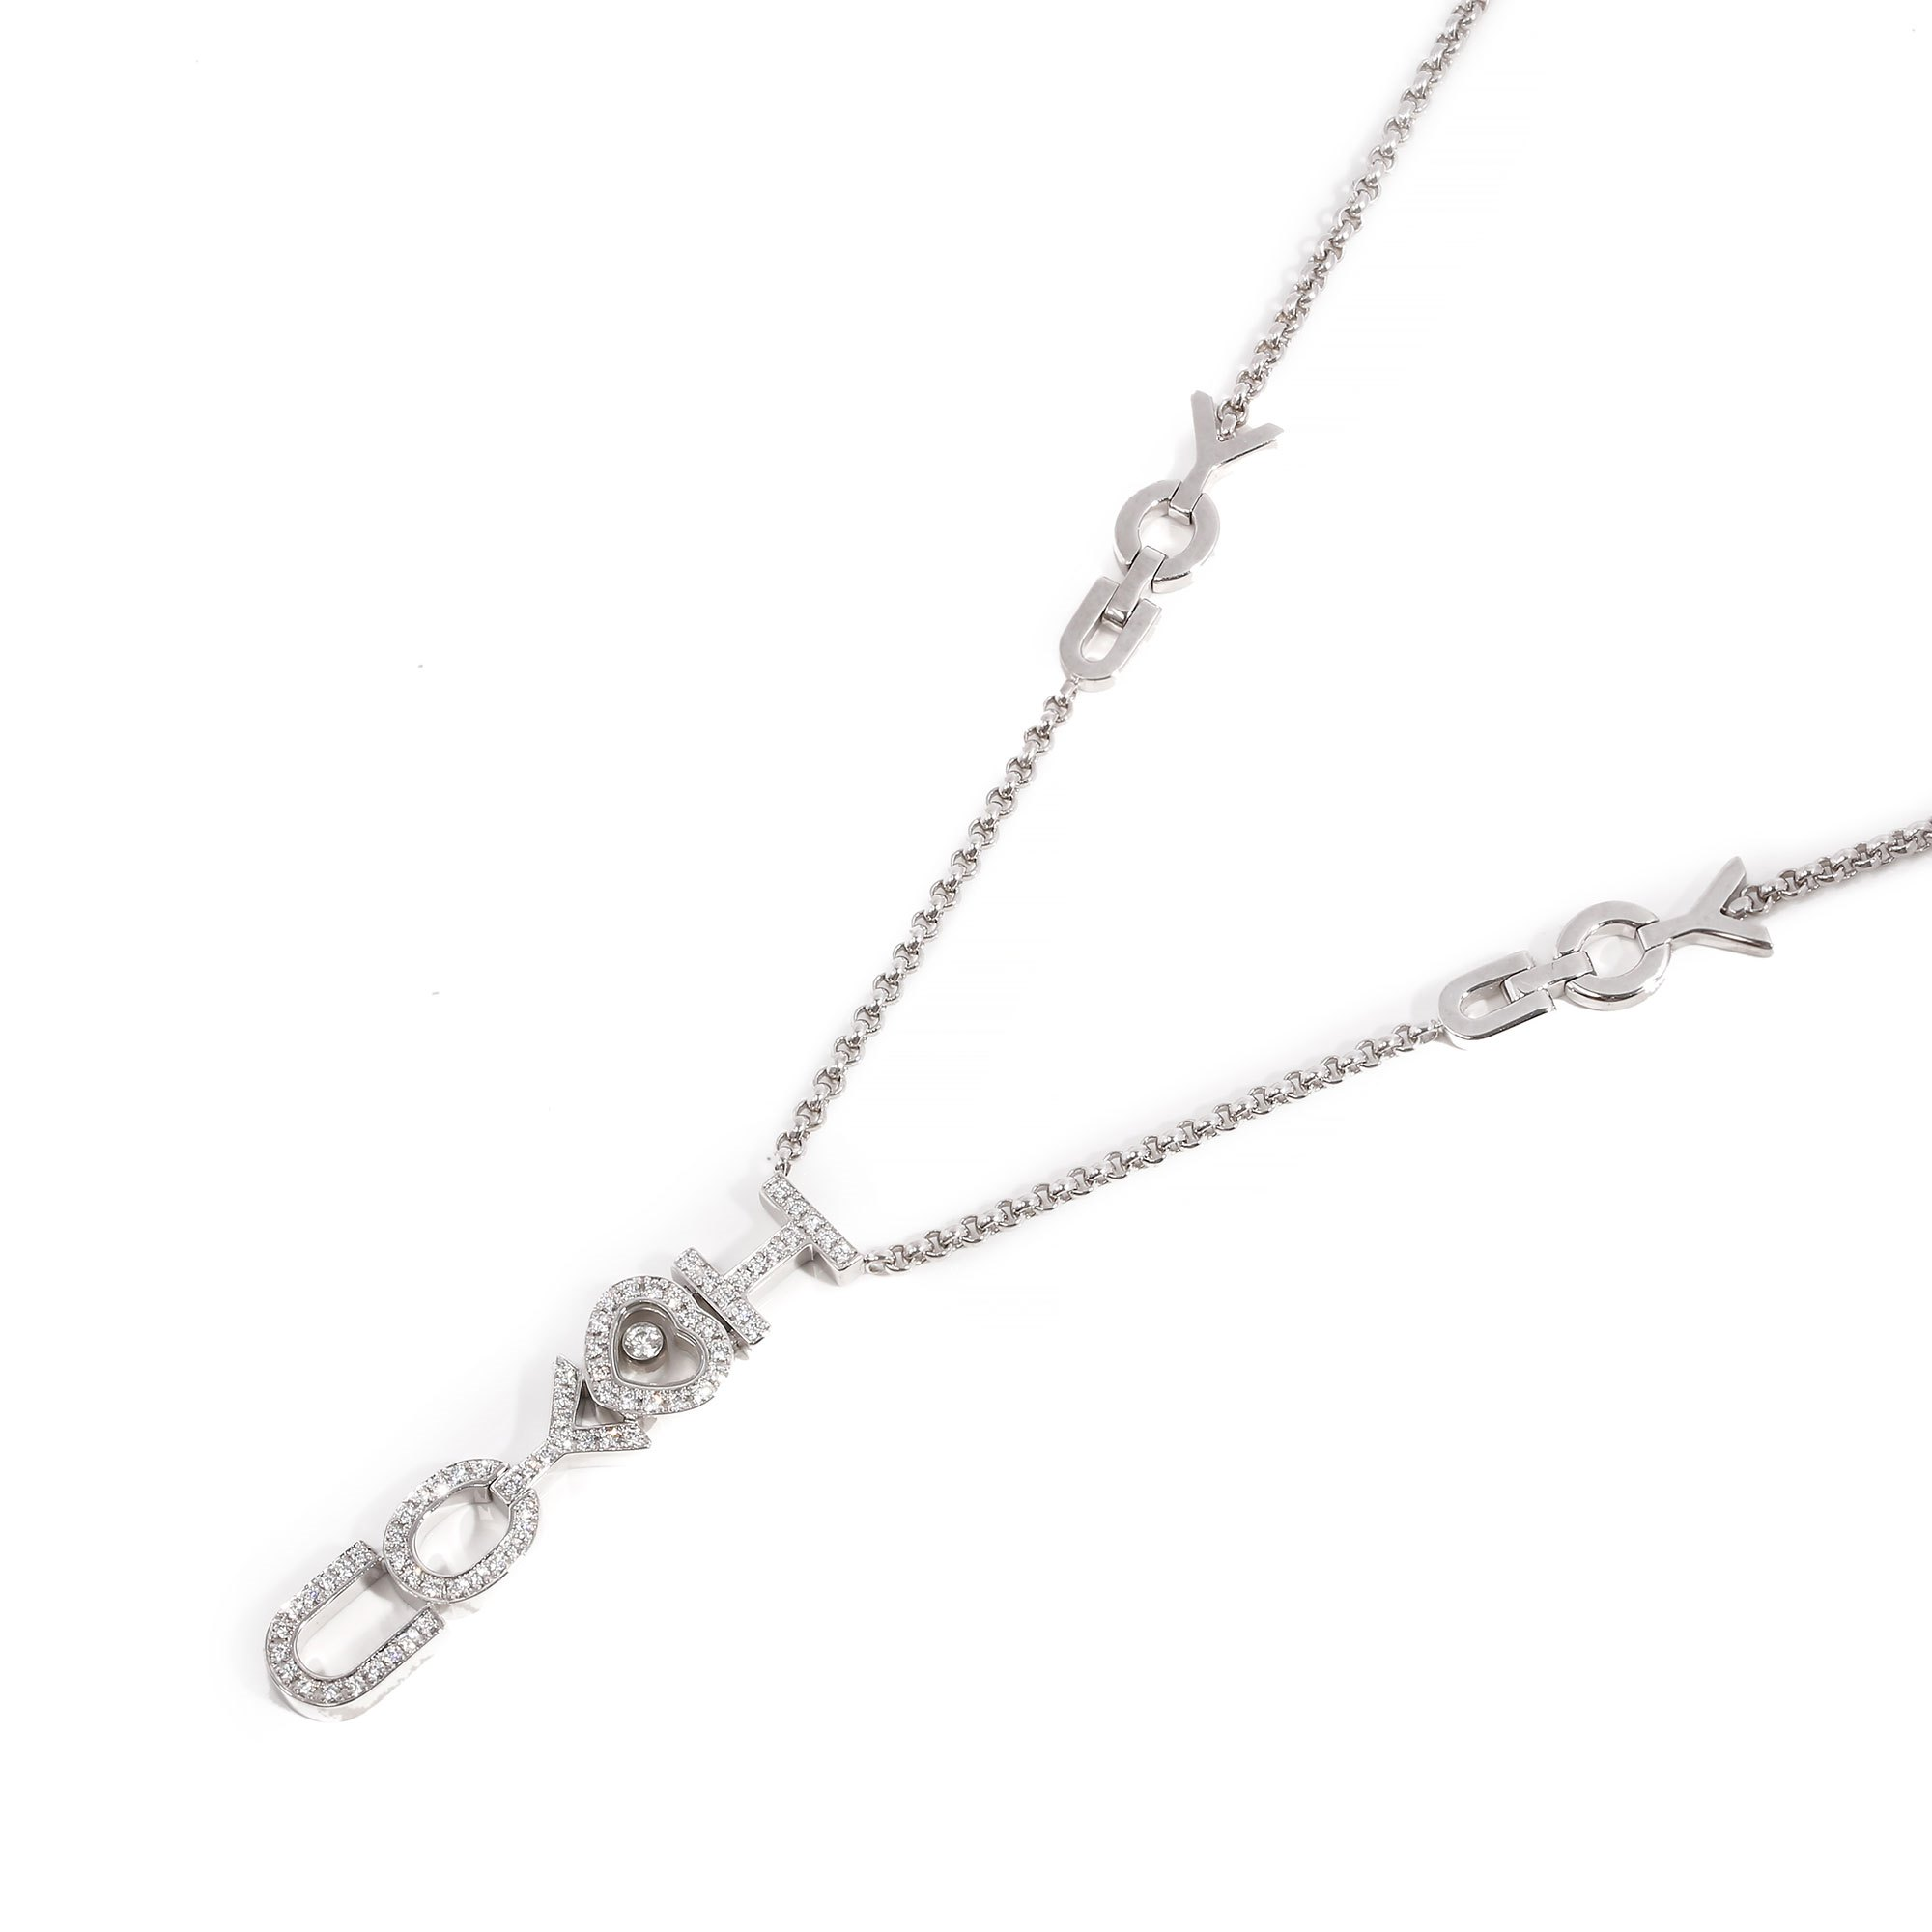 Chopard I love you pendant